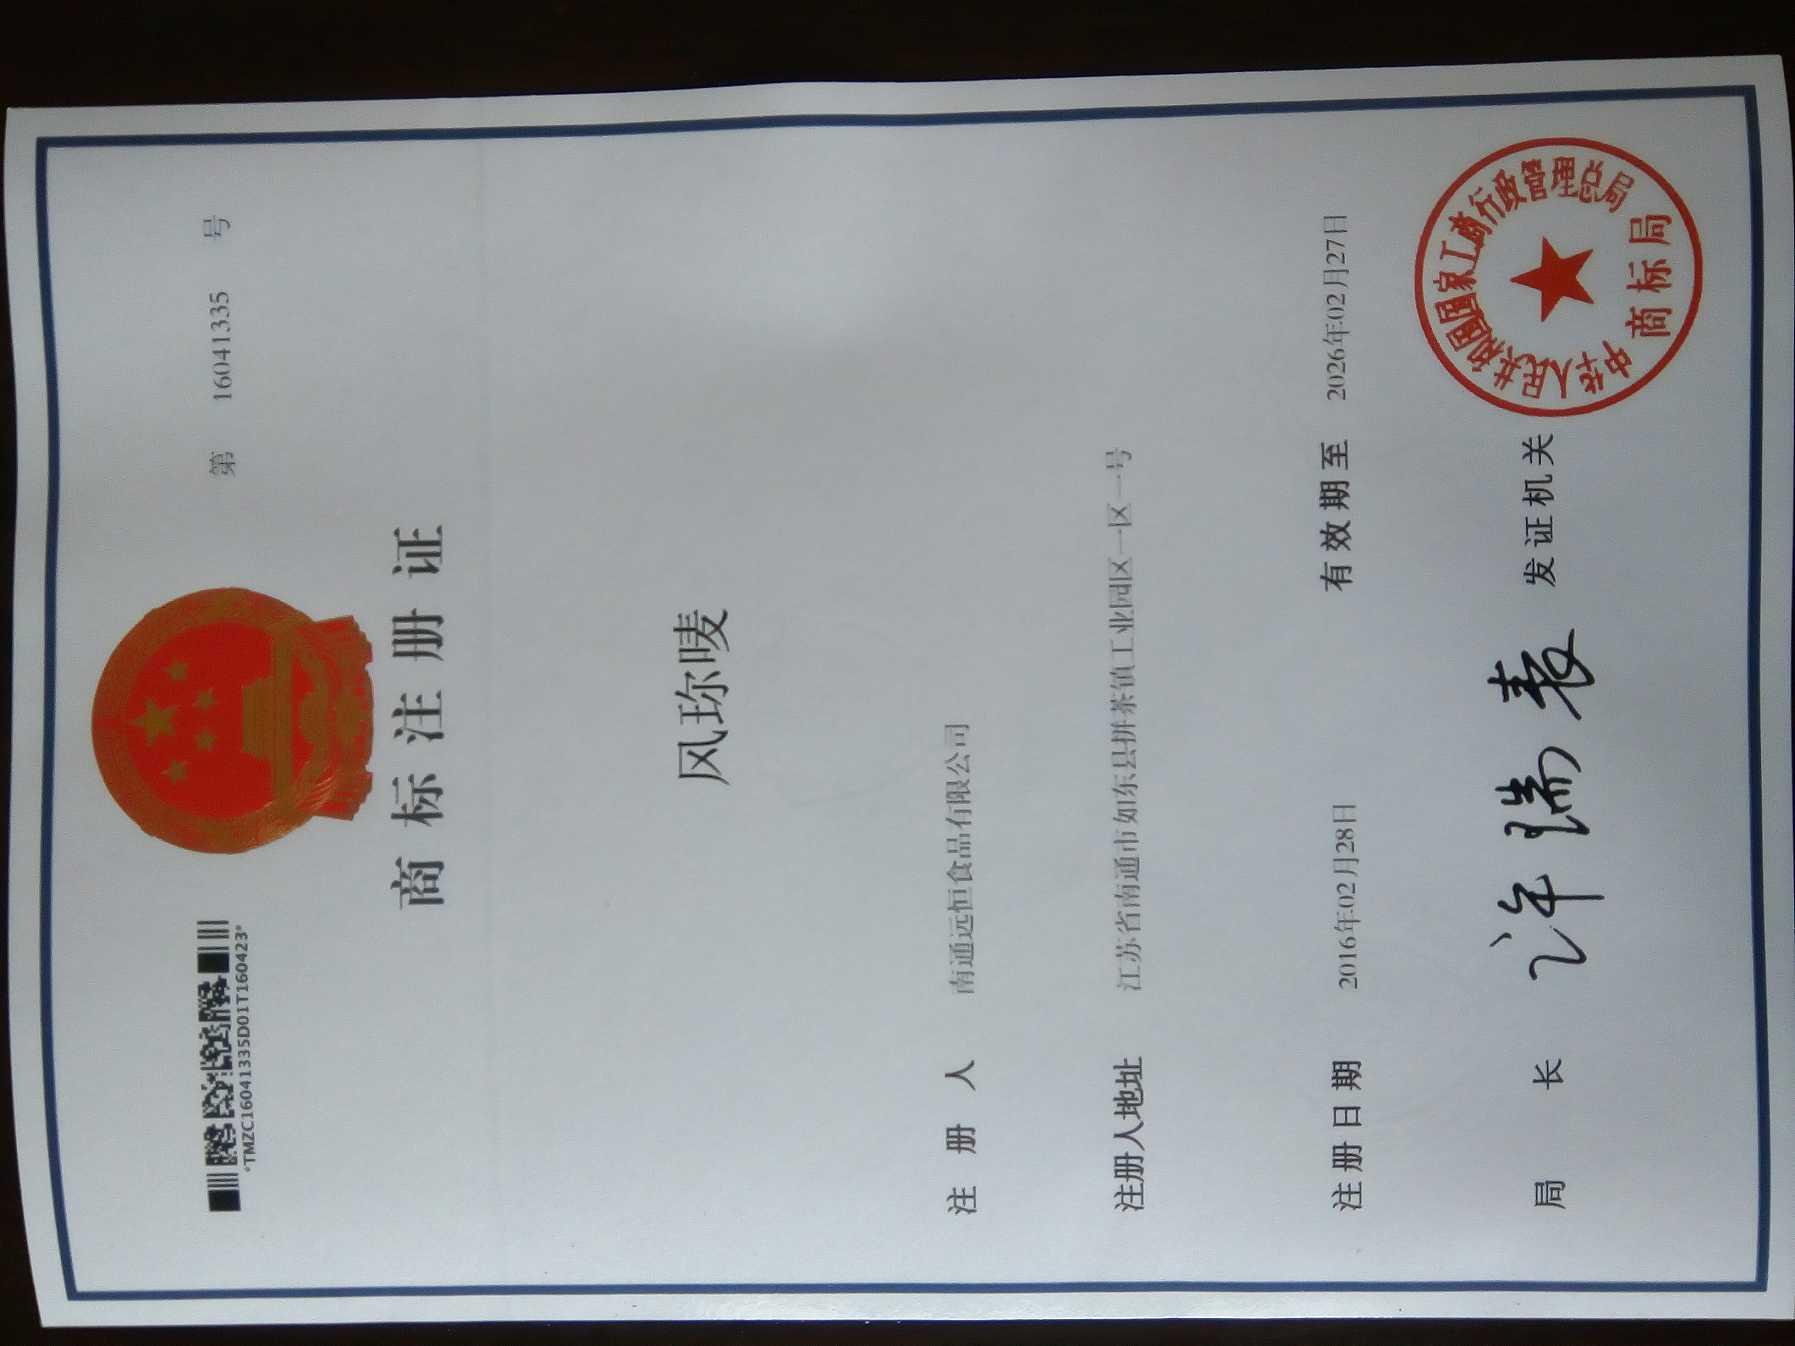 OEM brand certificate TOMATO SAUCE